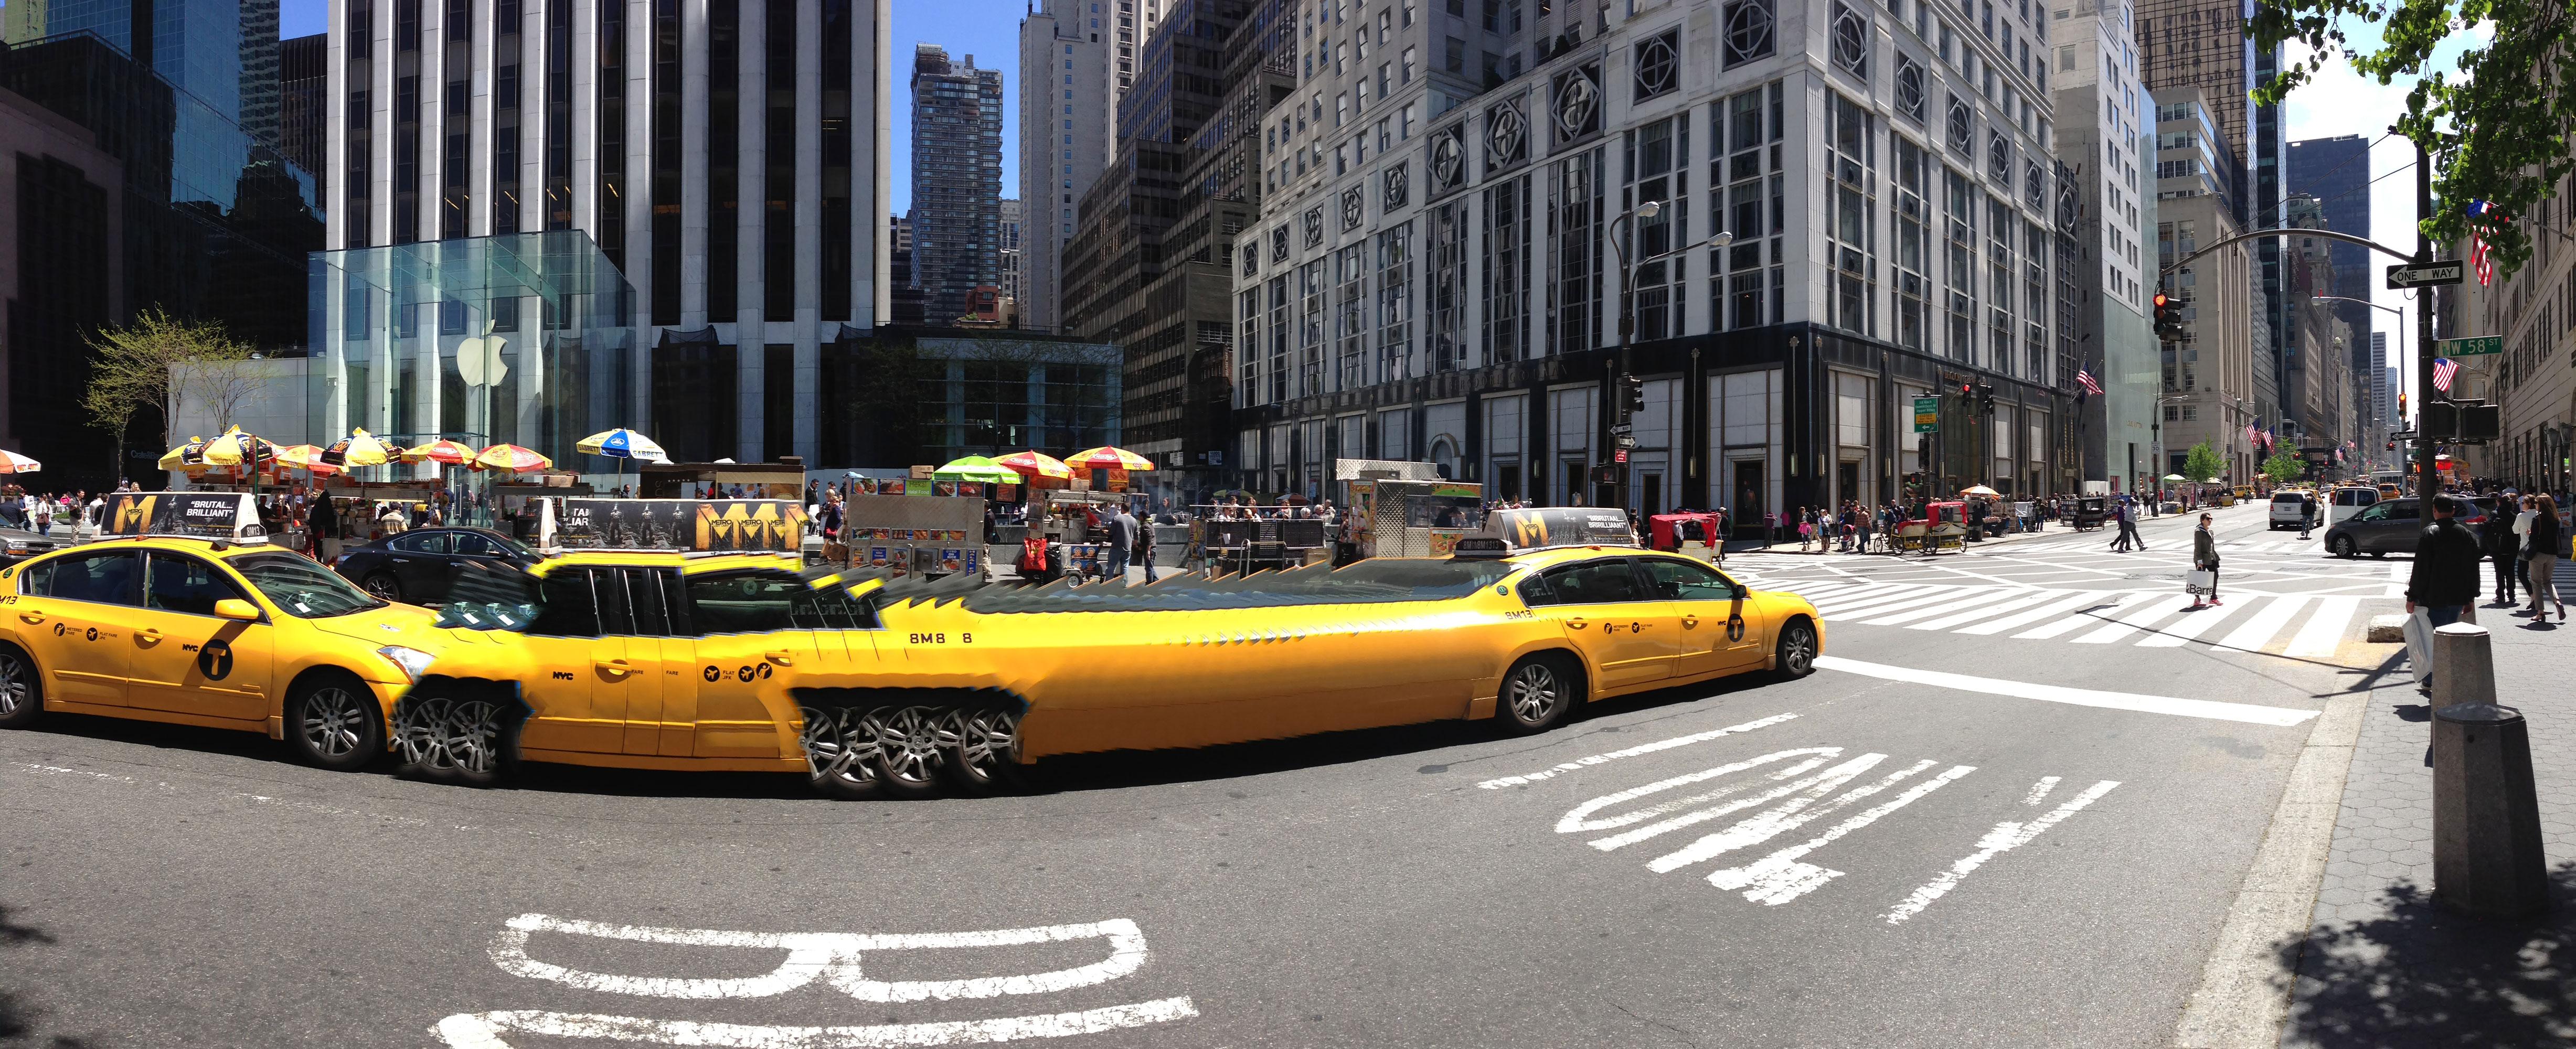 NYC Glitched